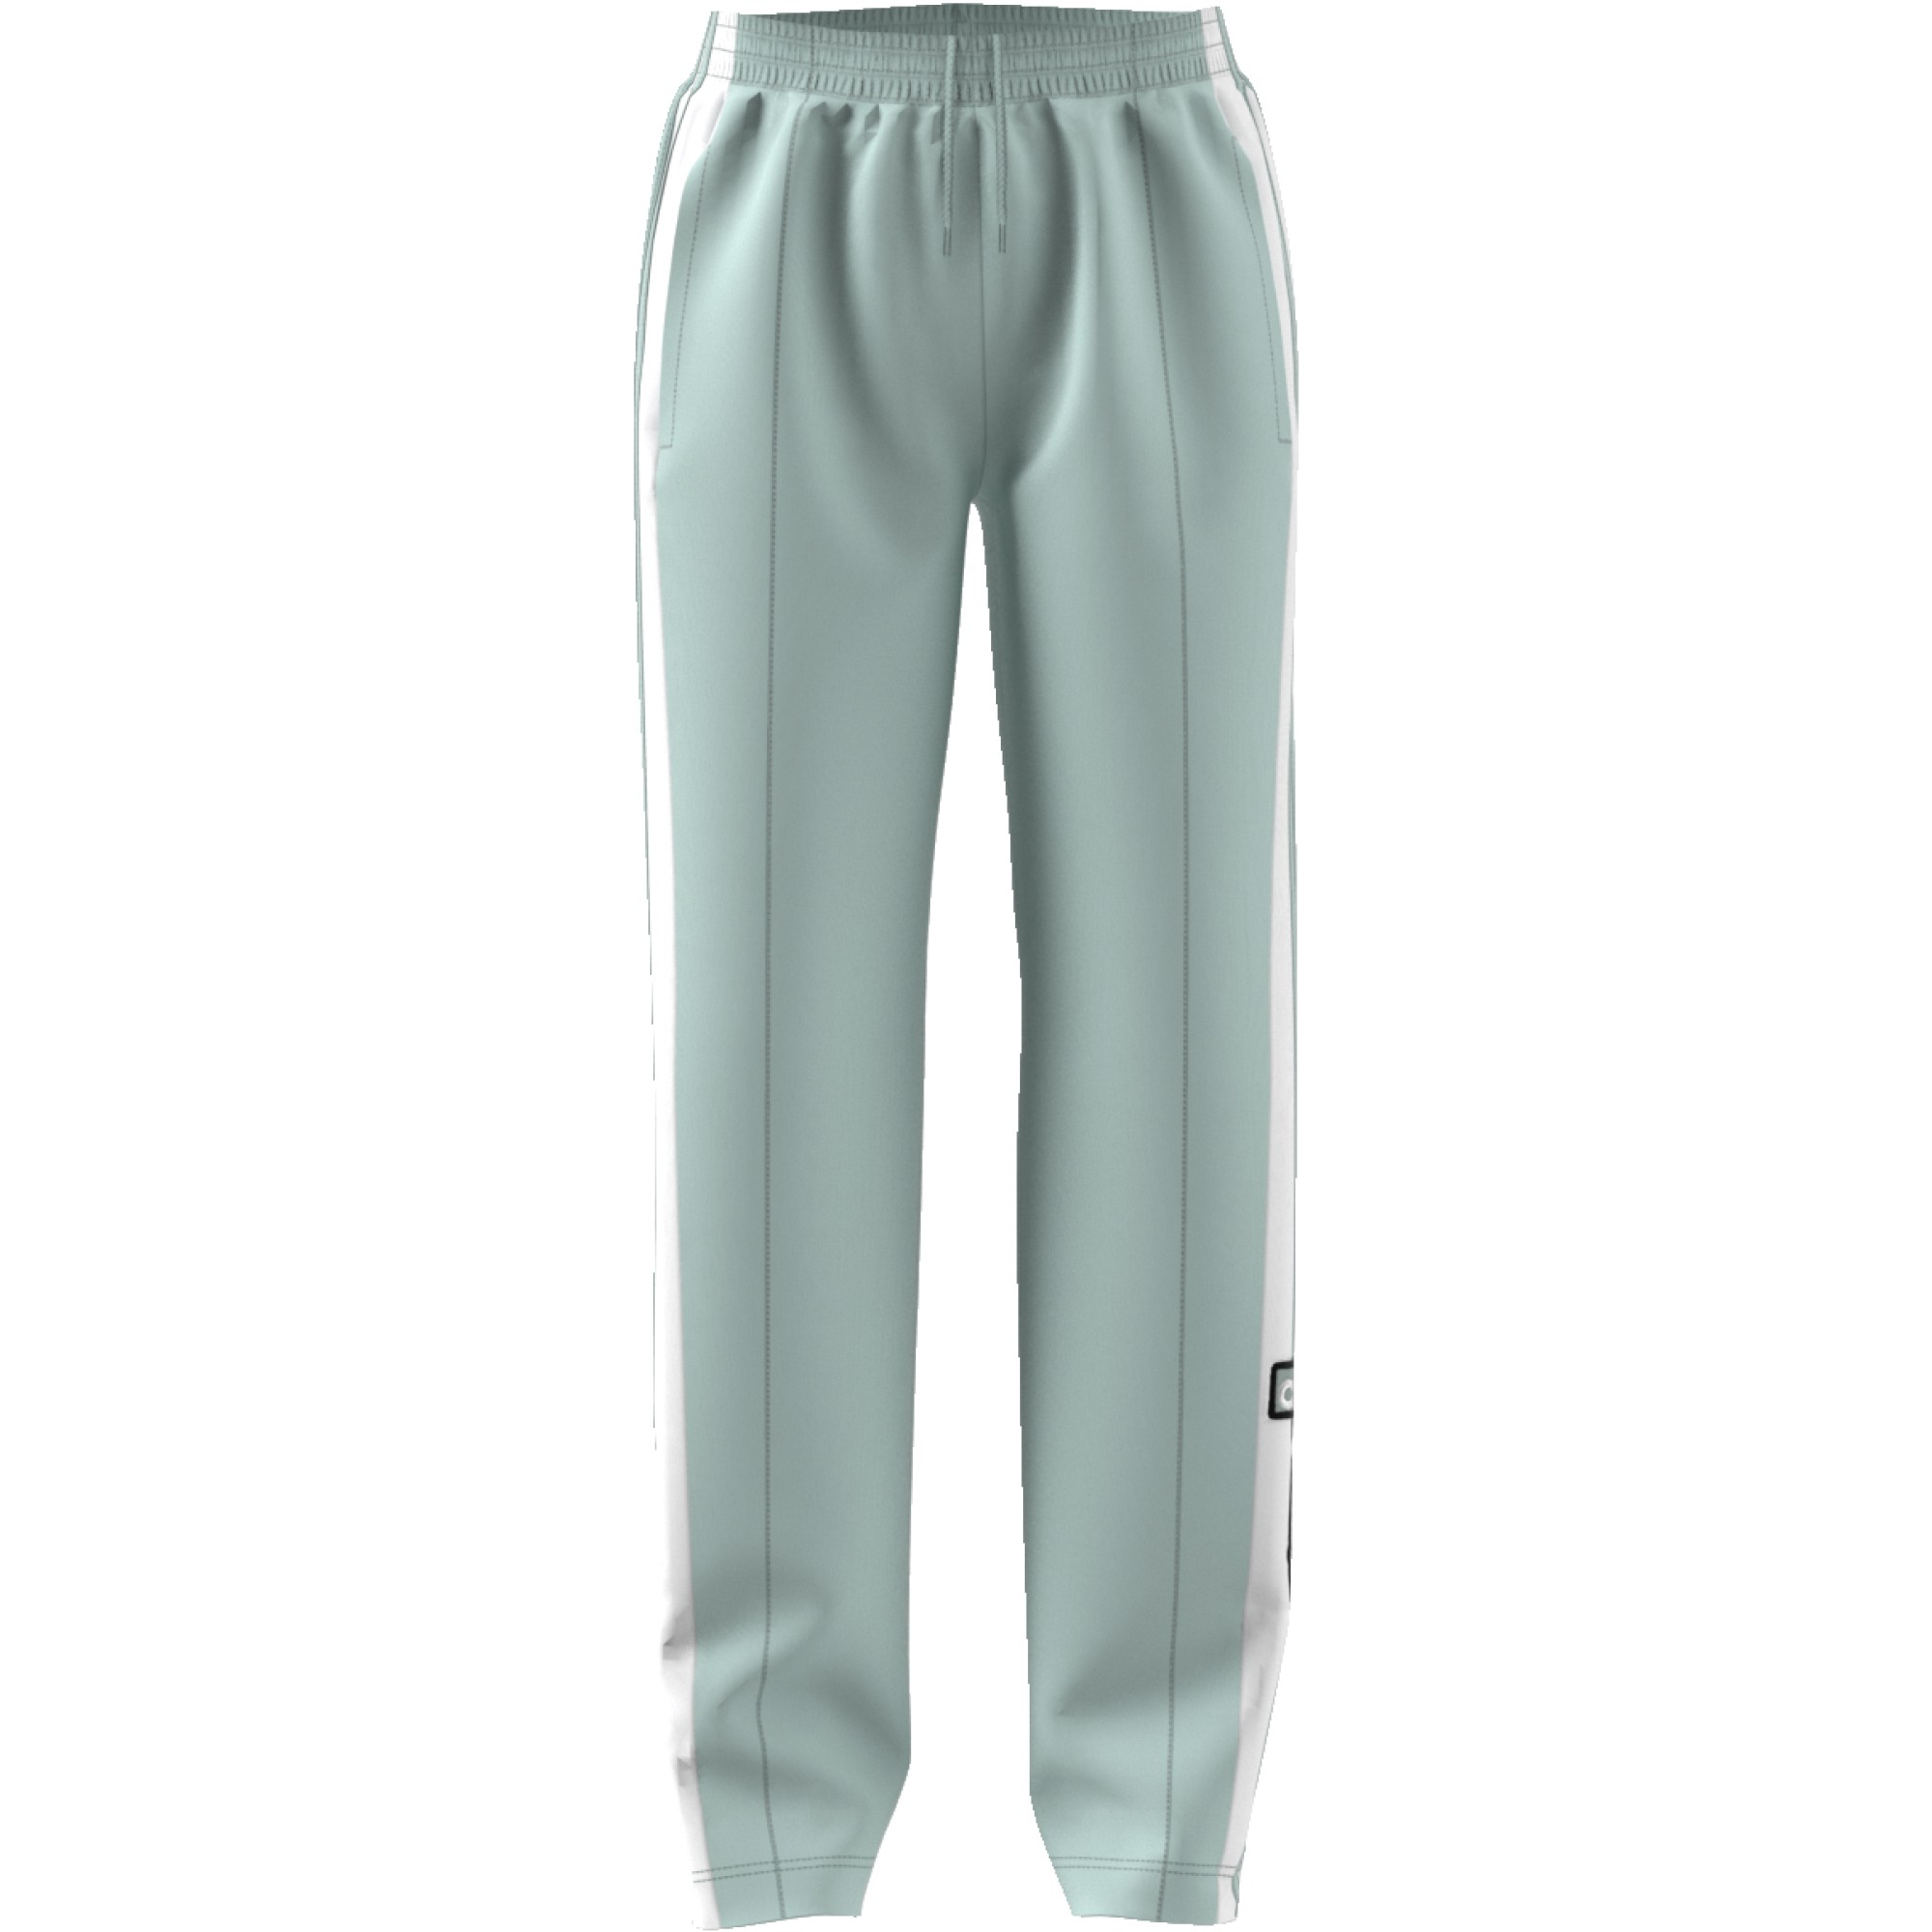 Claro Azul Moya Mujer Adibreak Deportes Pantalón Adidas SpGqMVUz